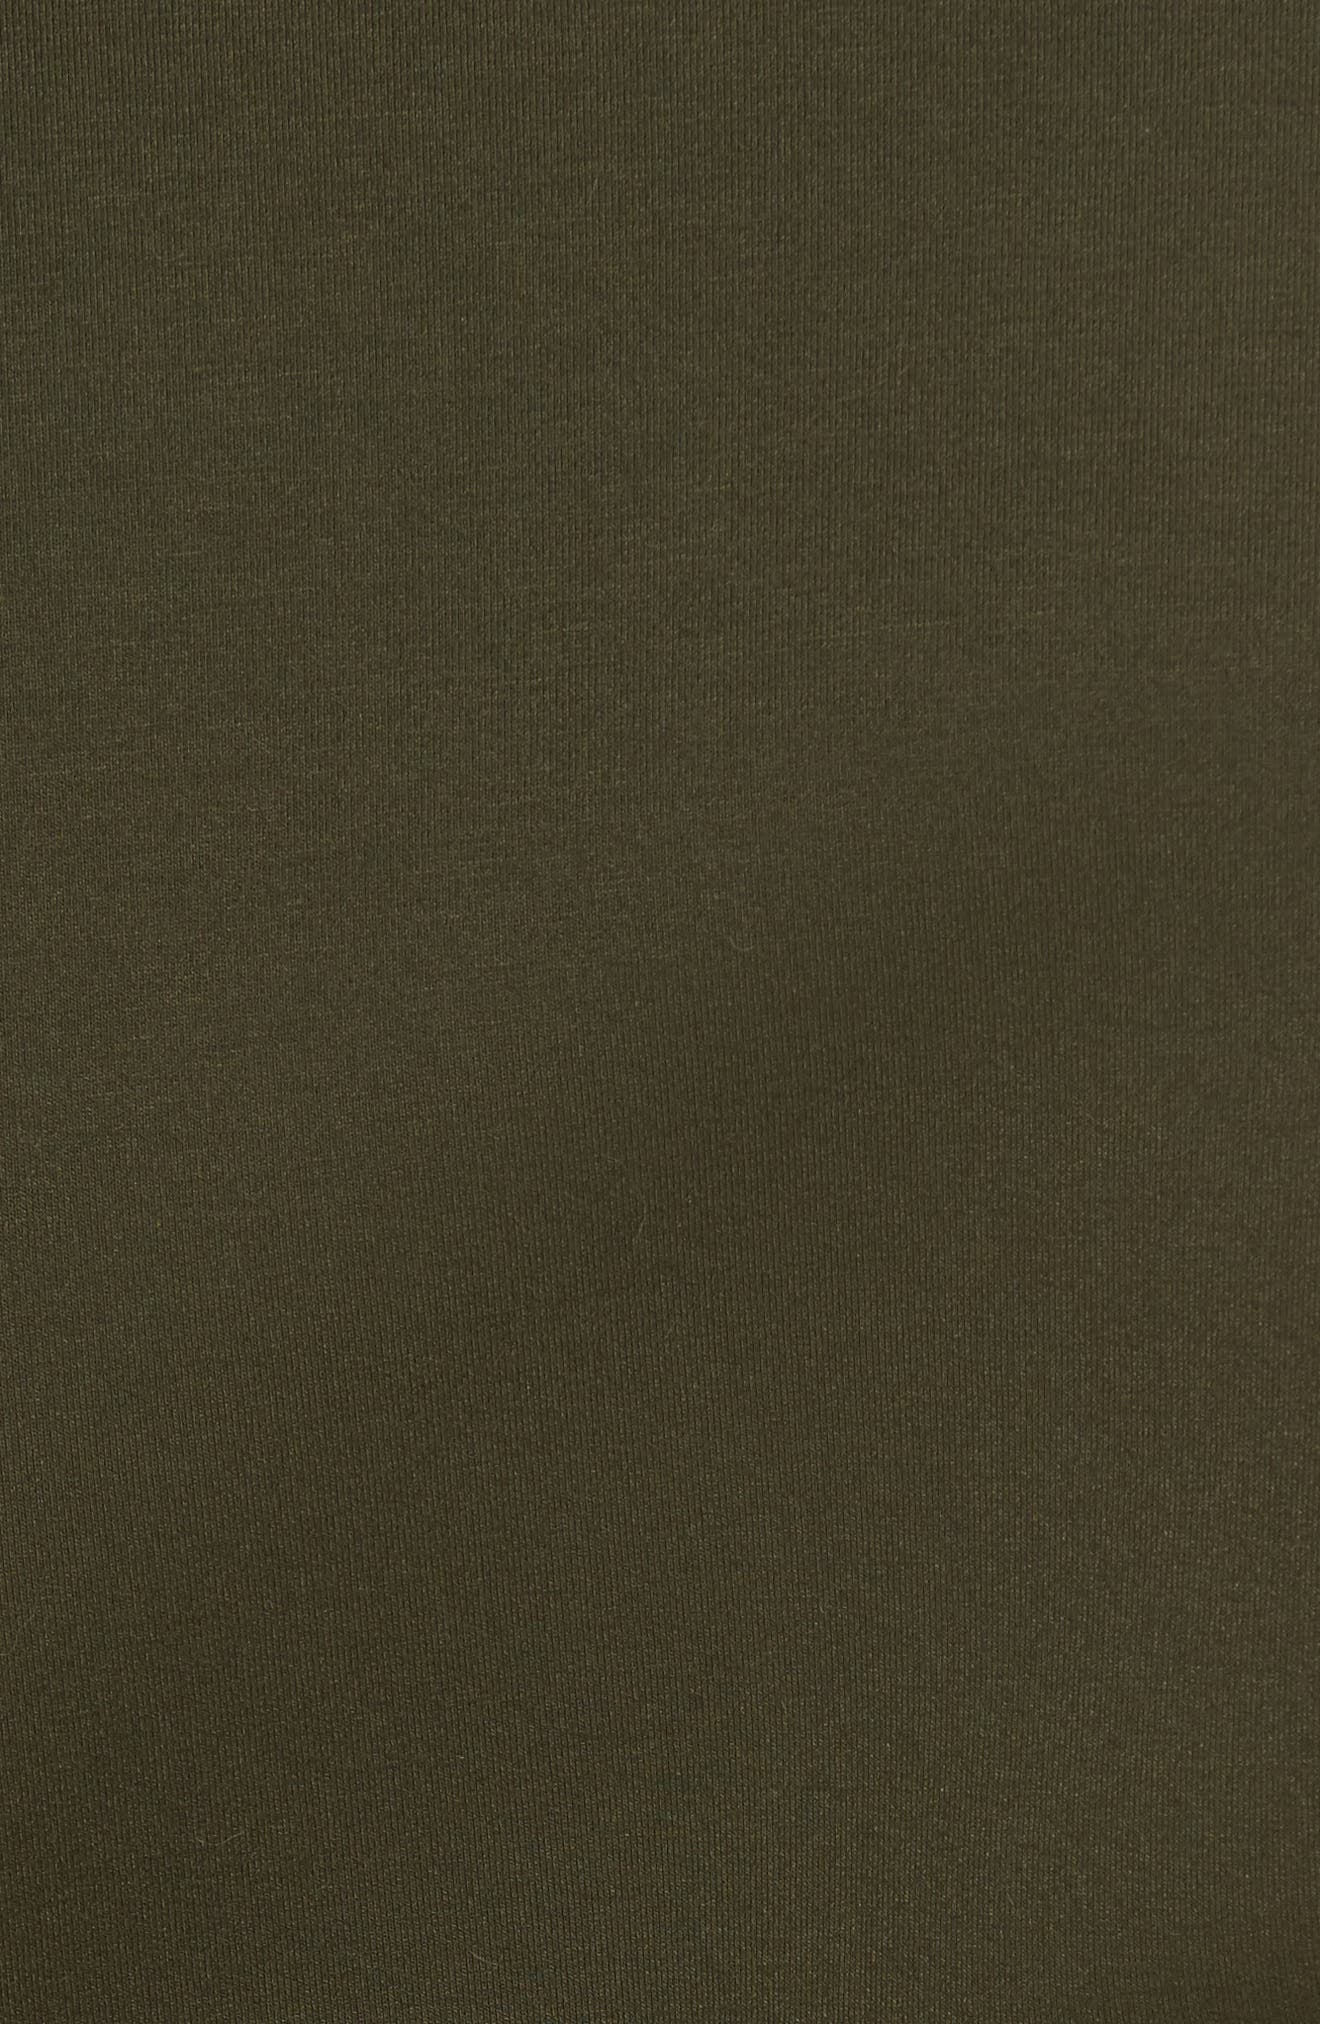 Cosy Neo Track Jacket,                             Alternate thumbnail 6, color,                             354